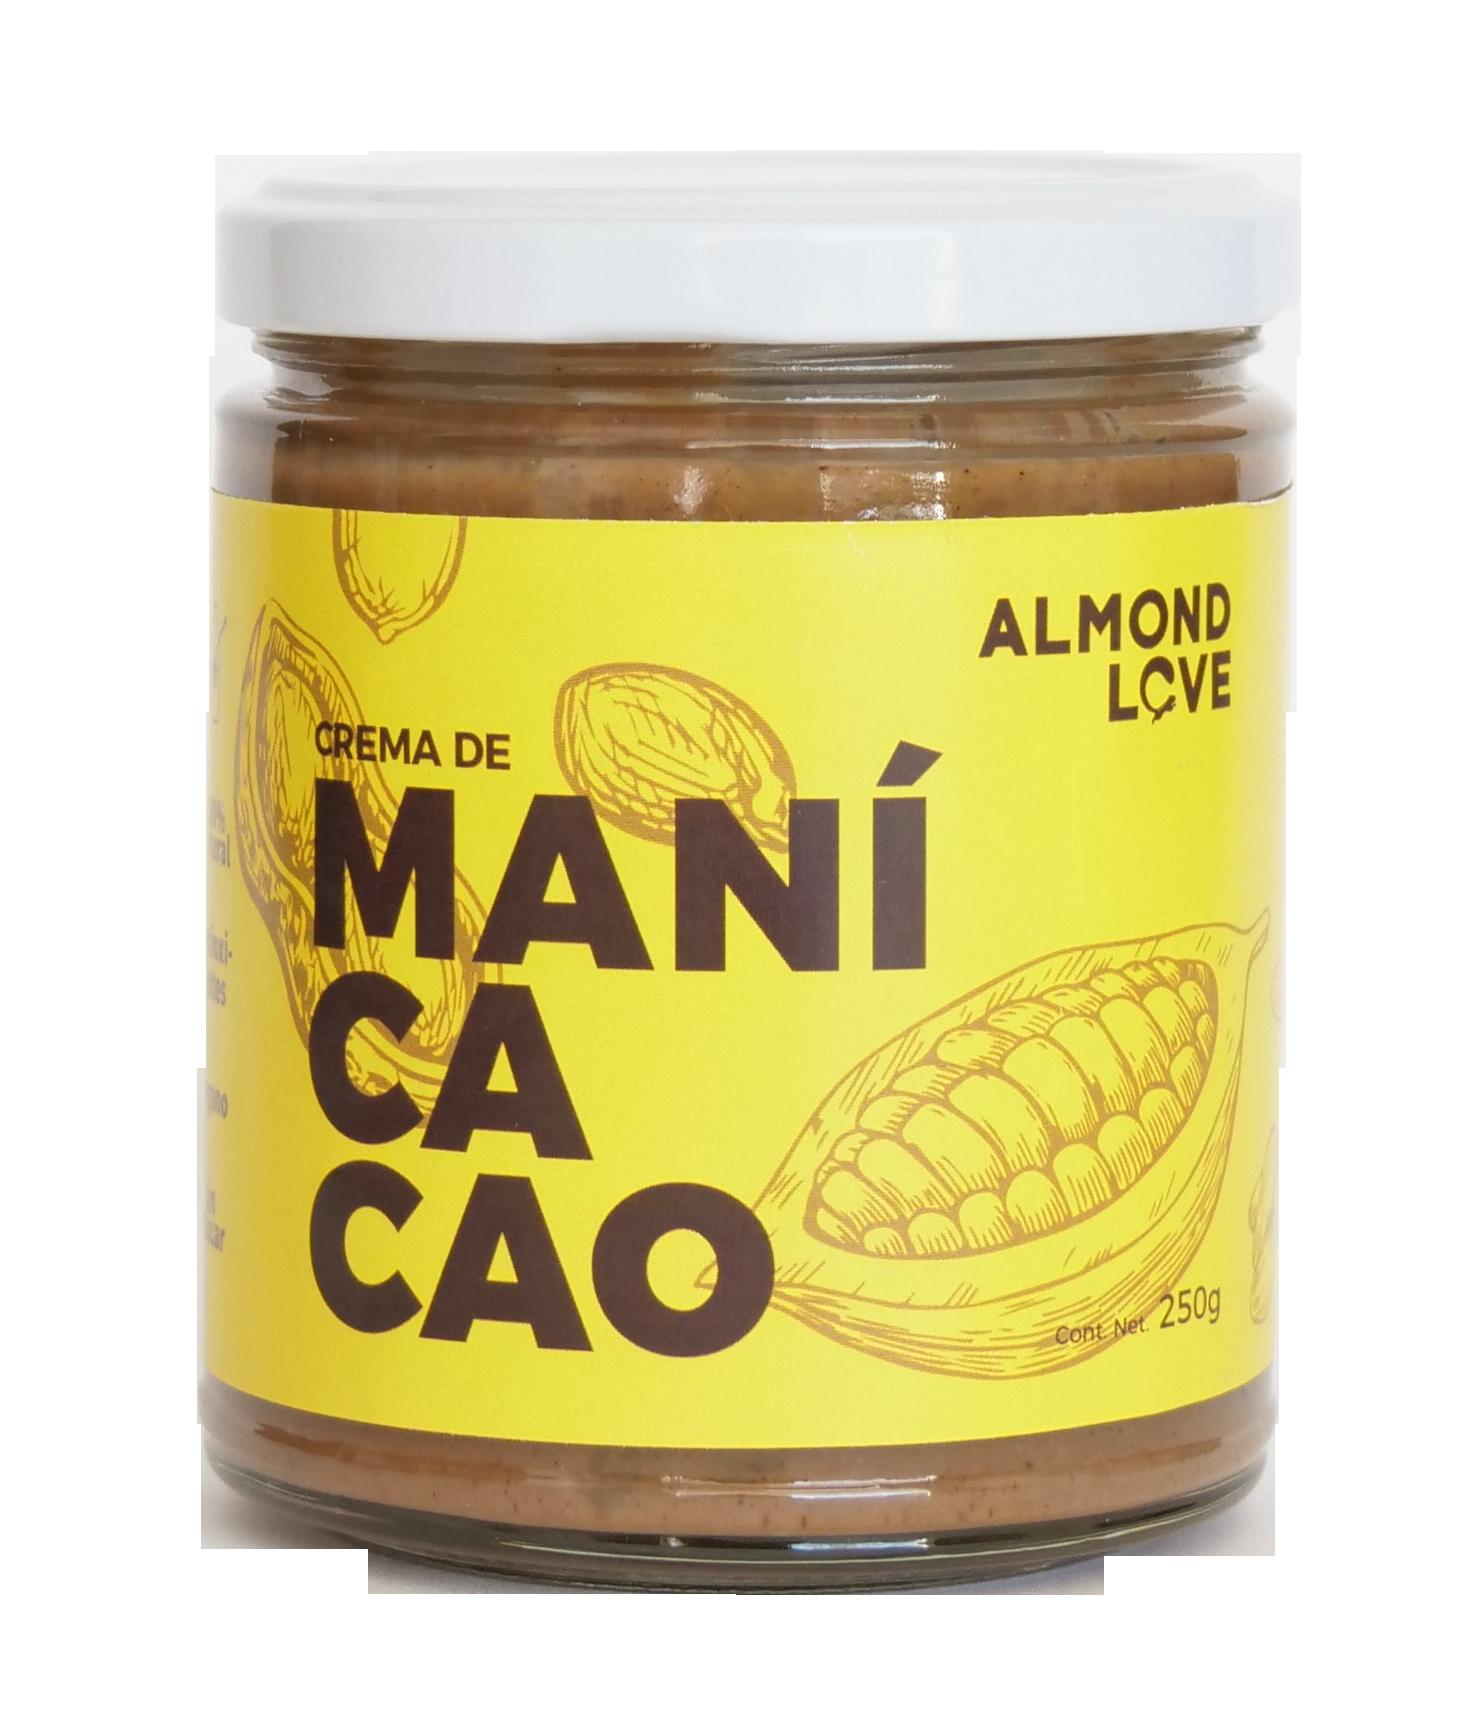 Untable Maní Cacao